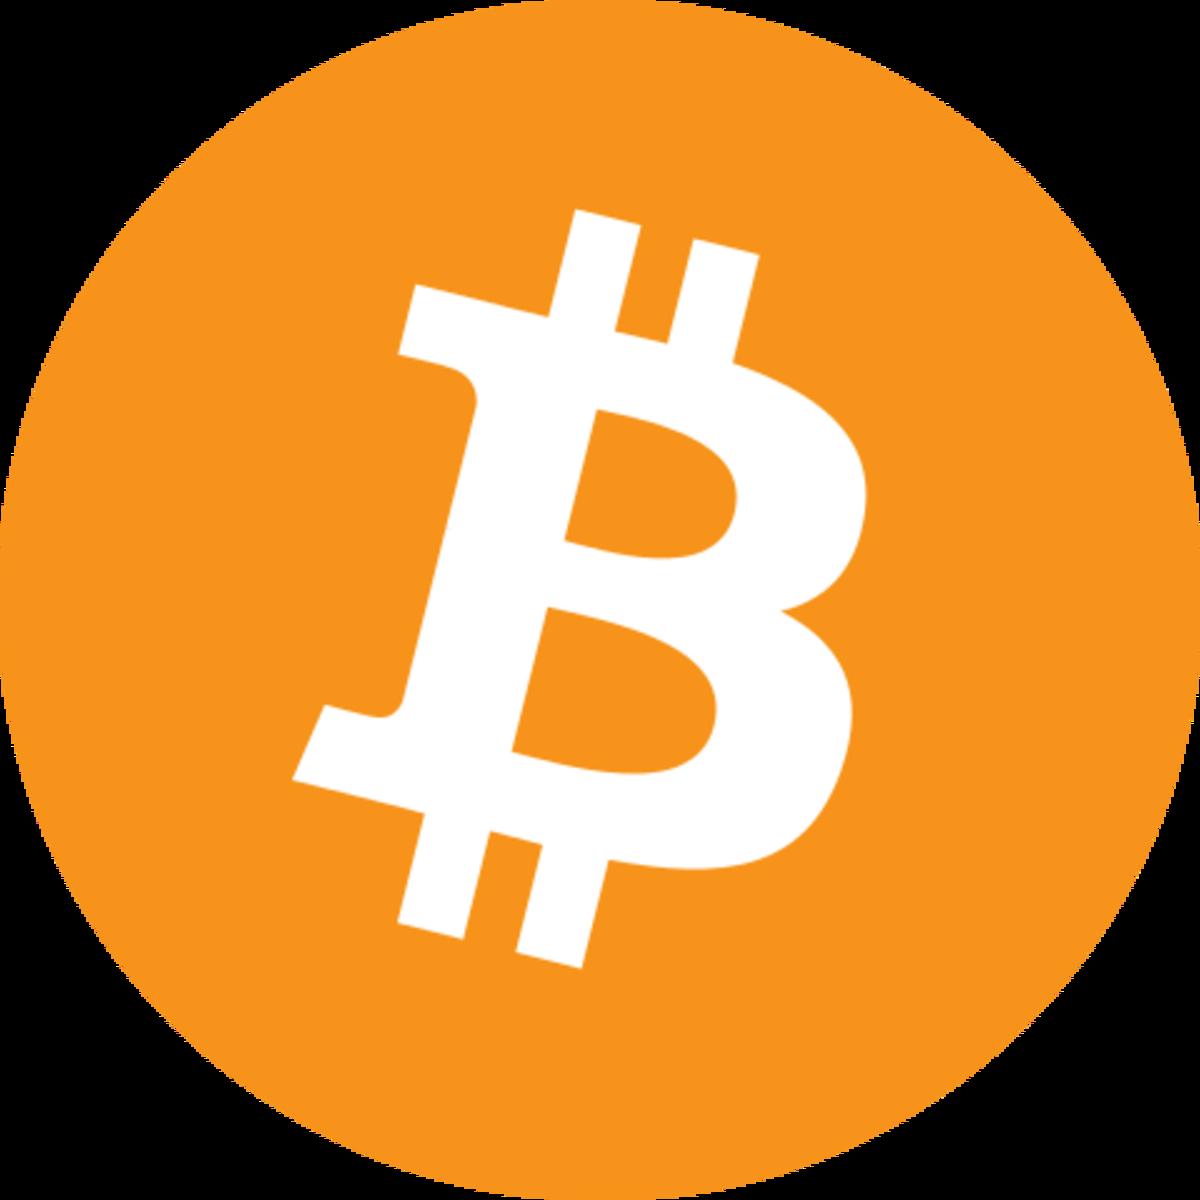 earn bitcoin doing nothing